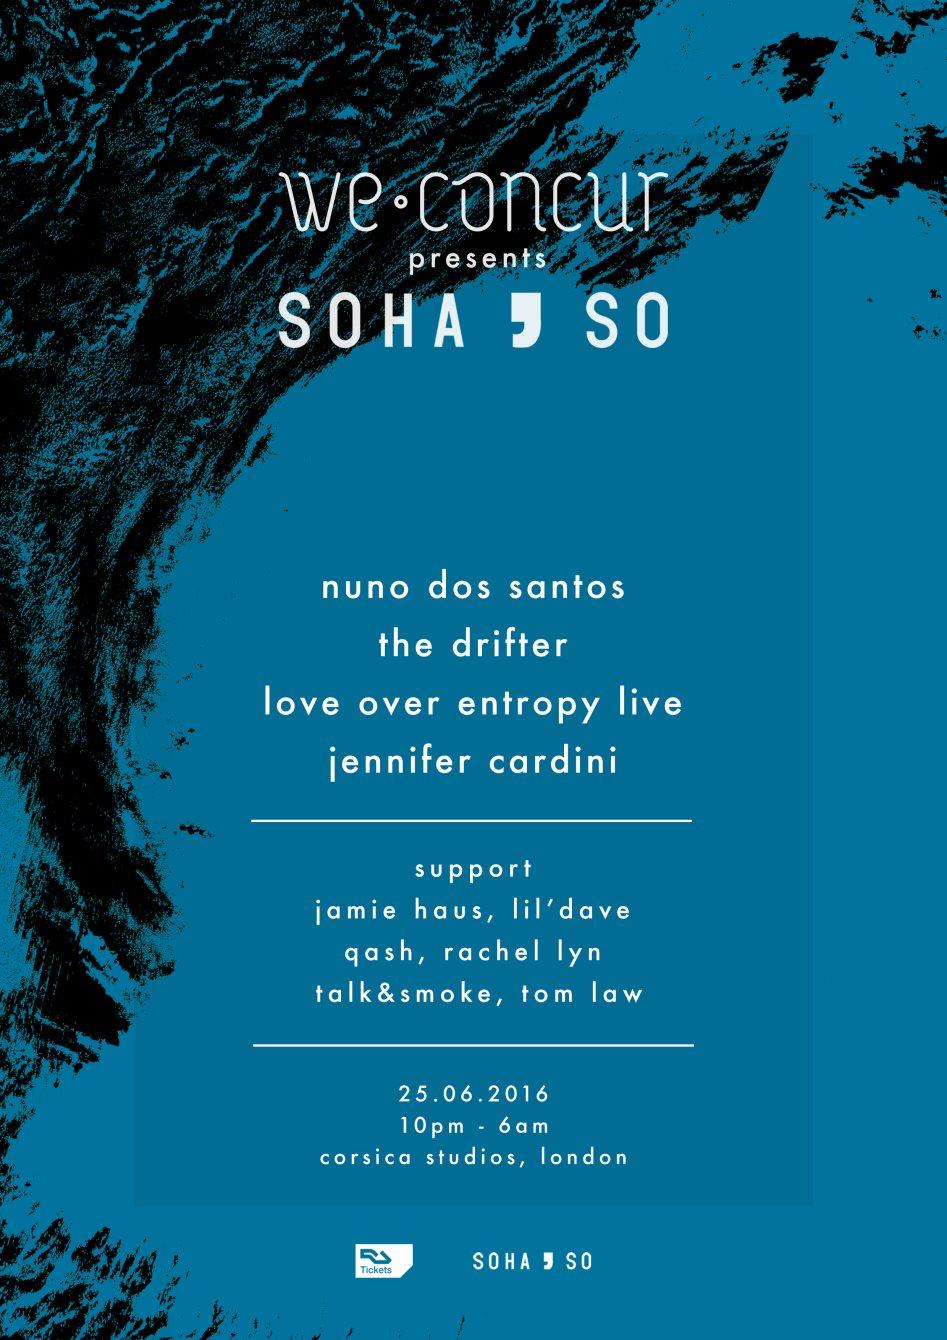 We Concur x Sohaso with Nuno Dos Santos, The Drifter, Jennifer Cardini - Flyer back